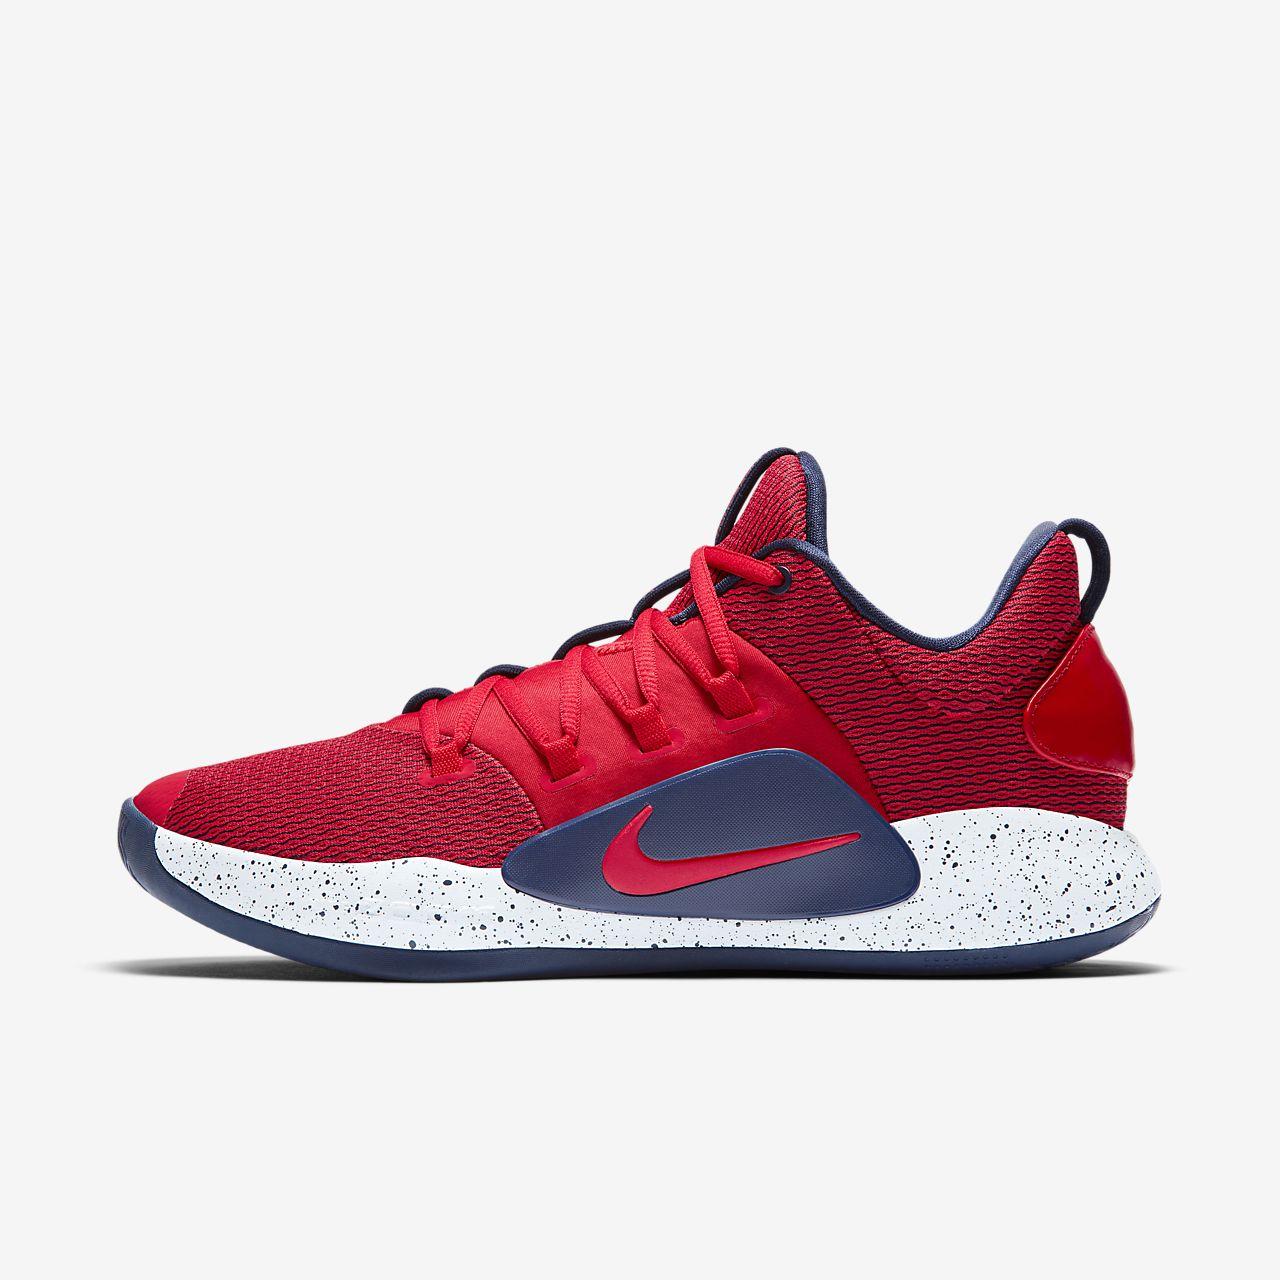 Nike Hyperdunk X Low basketsko til herre